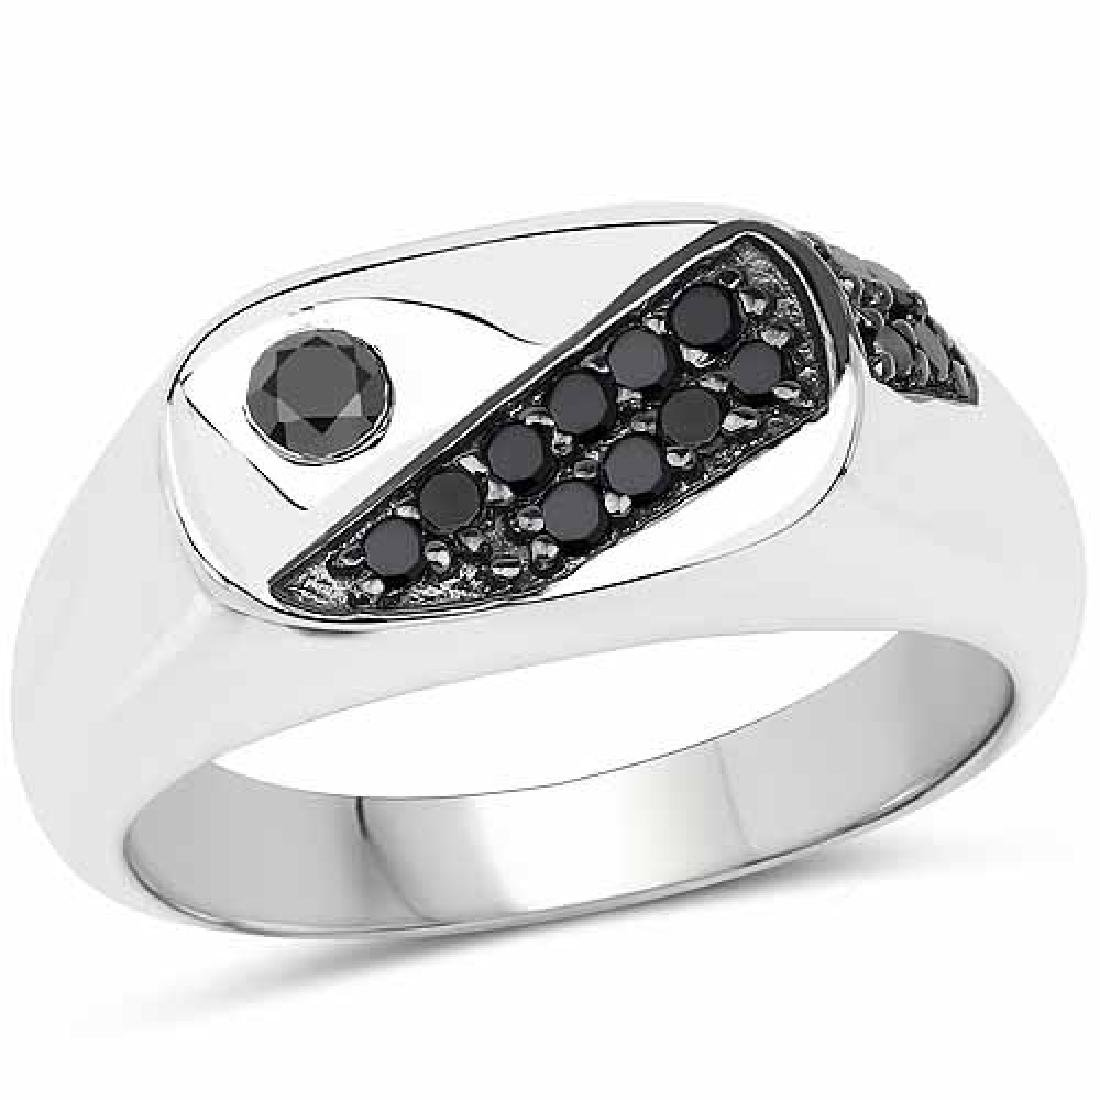 0.31 Carat Genuine Black Diamond .925 Sterling Silver R